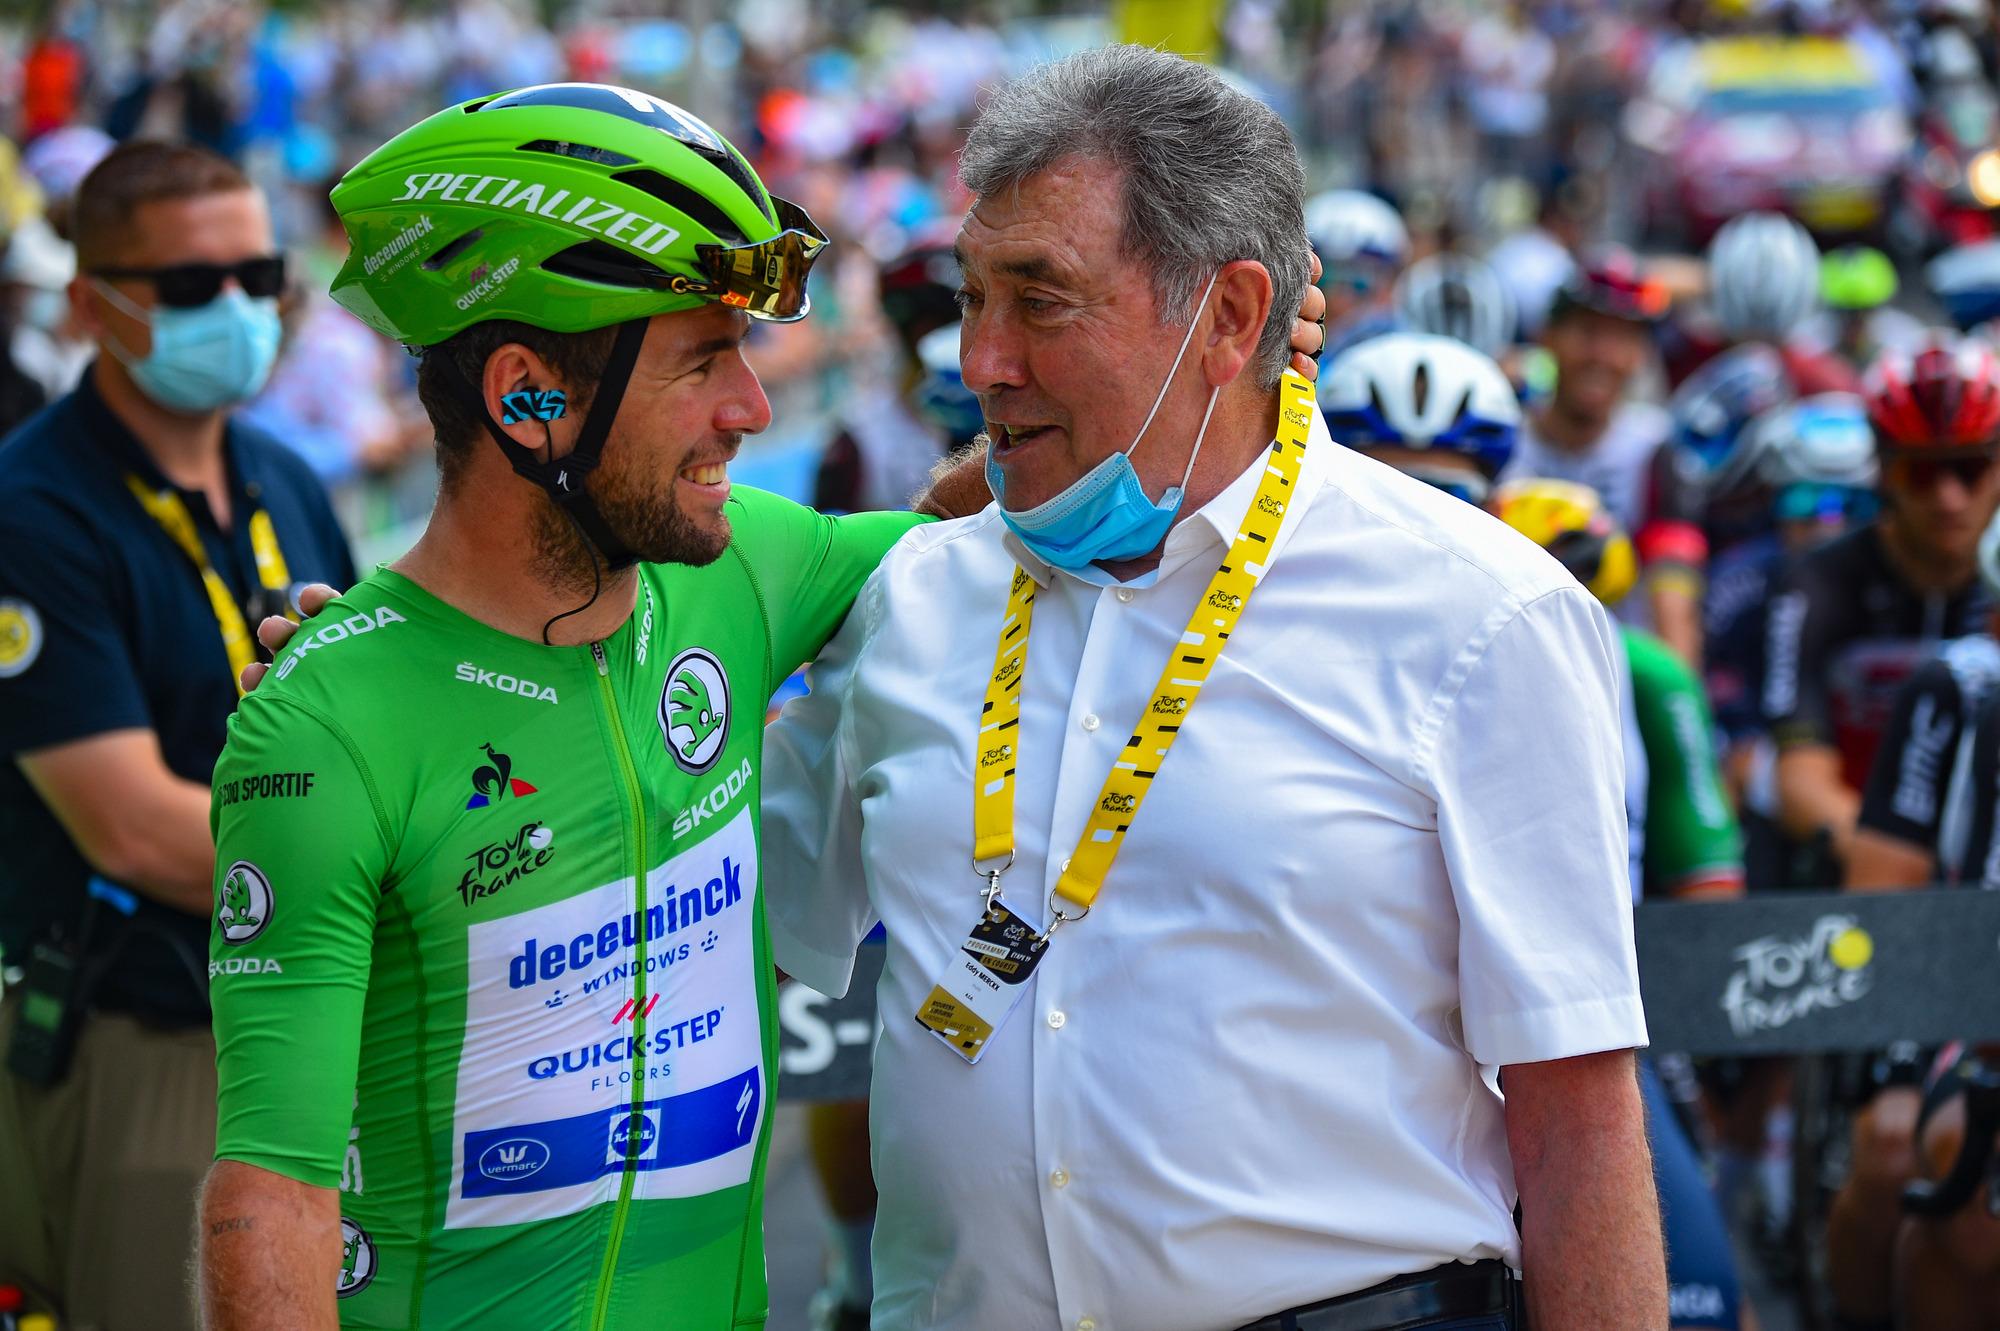 Tour de France 2021 - 108th Edition - 19th stage Mourenx - Libourne 207 km - 16/07/2021 - Mark Cavendish (GBR - Deceuninck - Quick-Step) - Eddy Merckx - photo Dario Belingheri/BettiniPhoto©2021